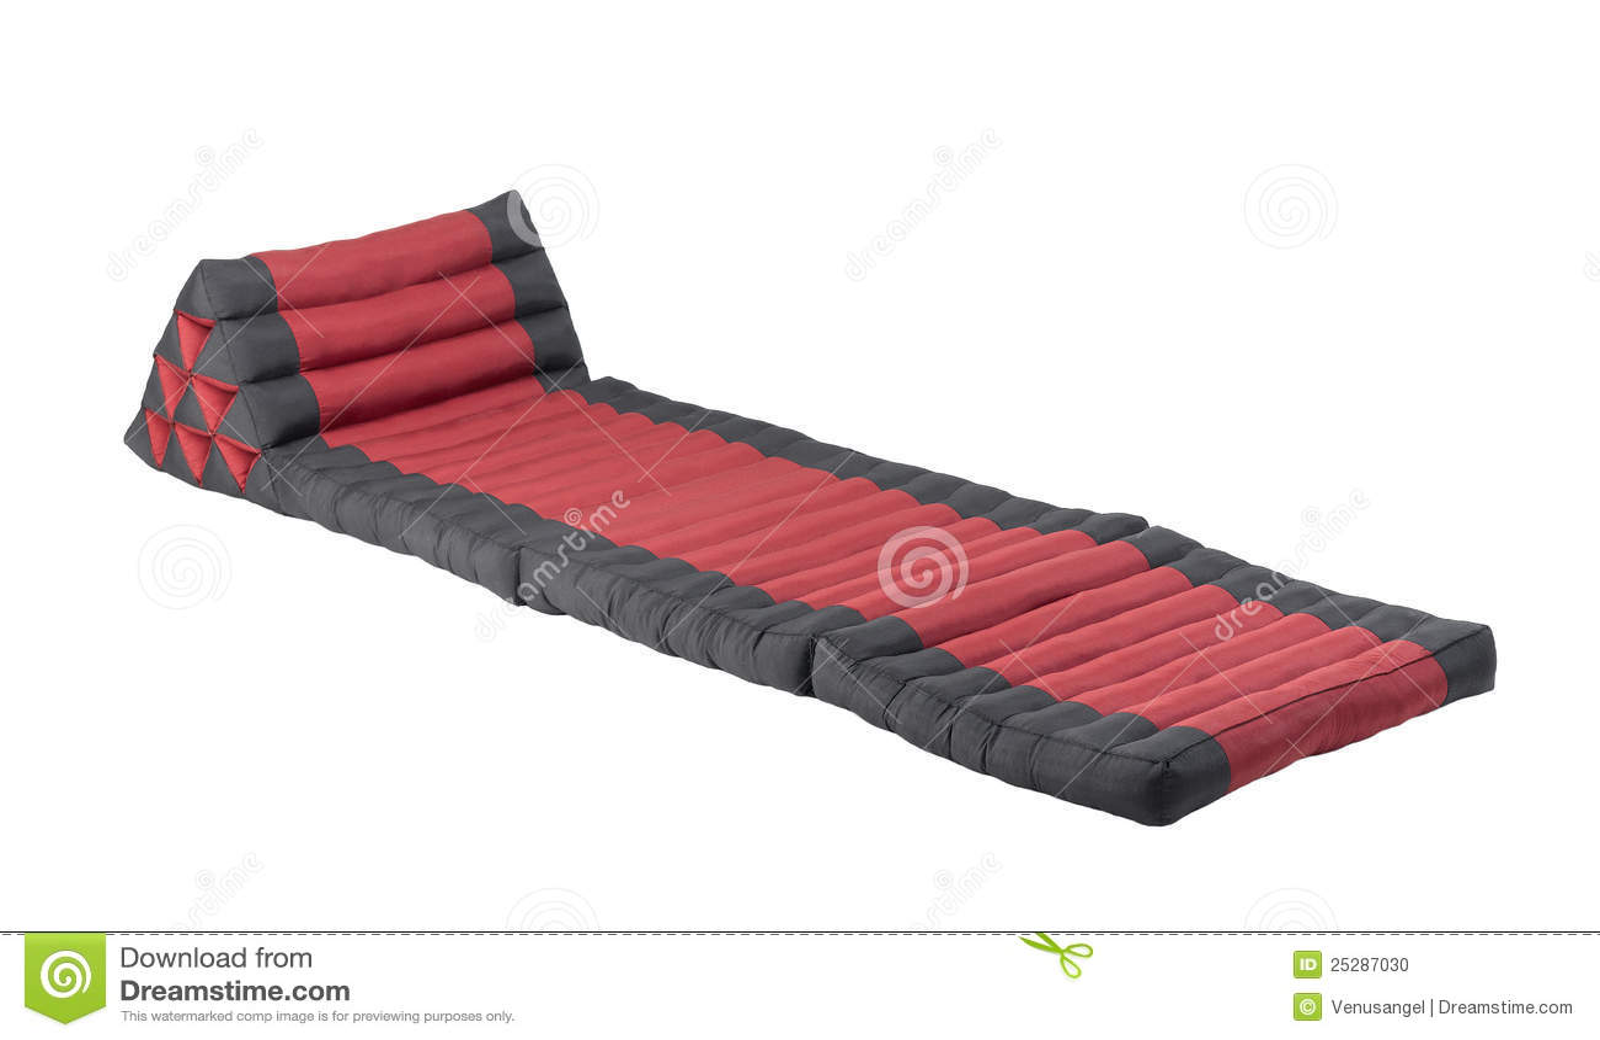 sofa bed 3 fold mattress semi circular triangle pillow with stock photo - image: 25287030